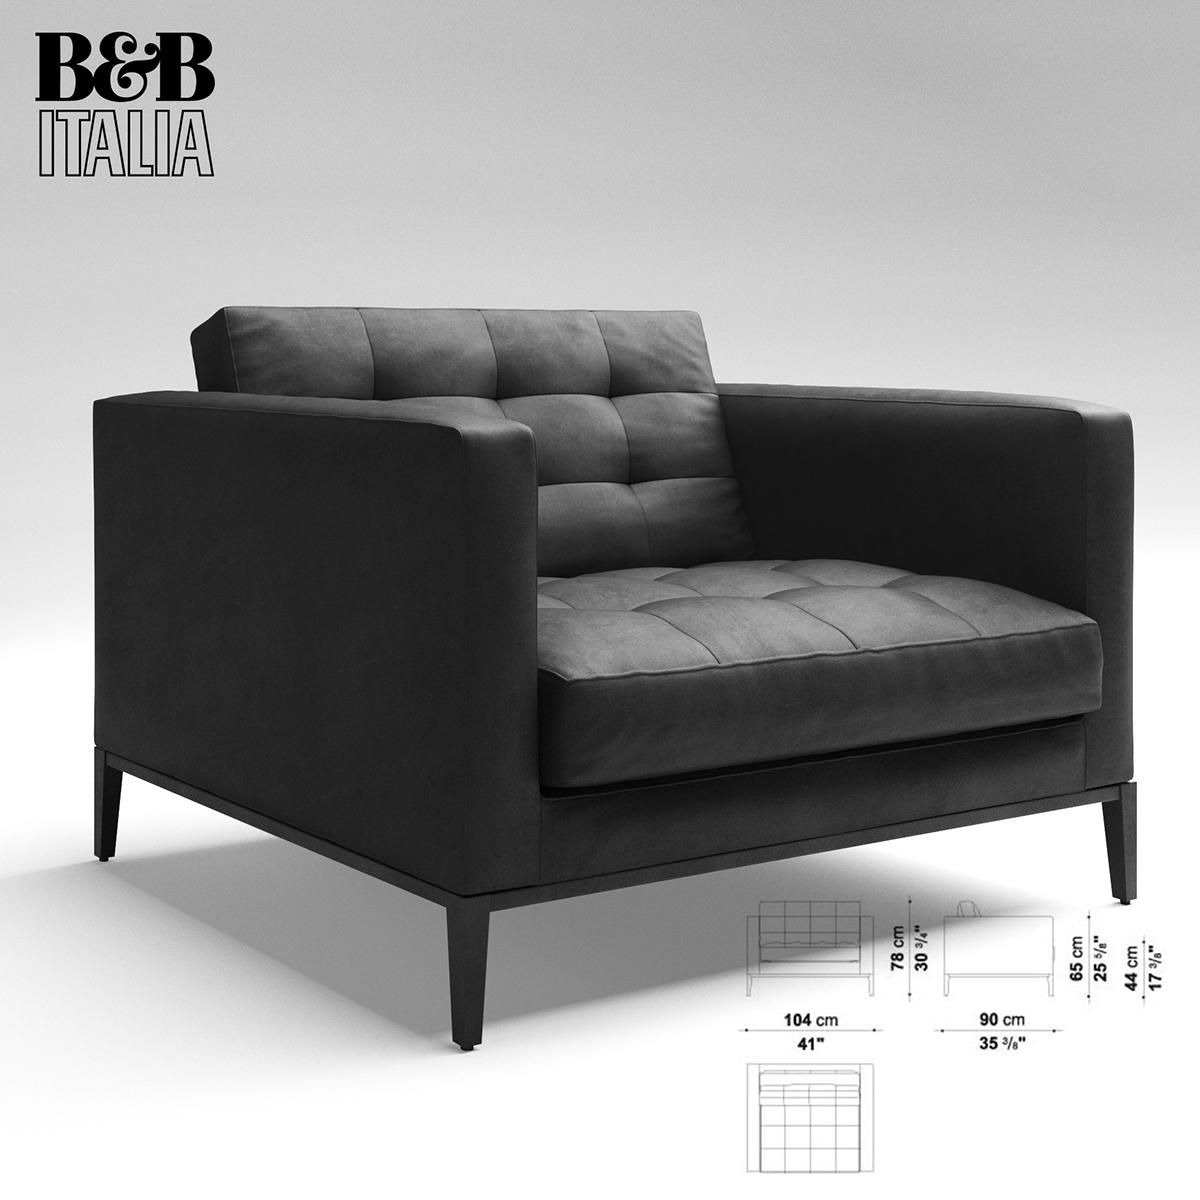 corona 3dmax 3D modelling chair B&B Italia photoshop